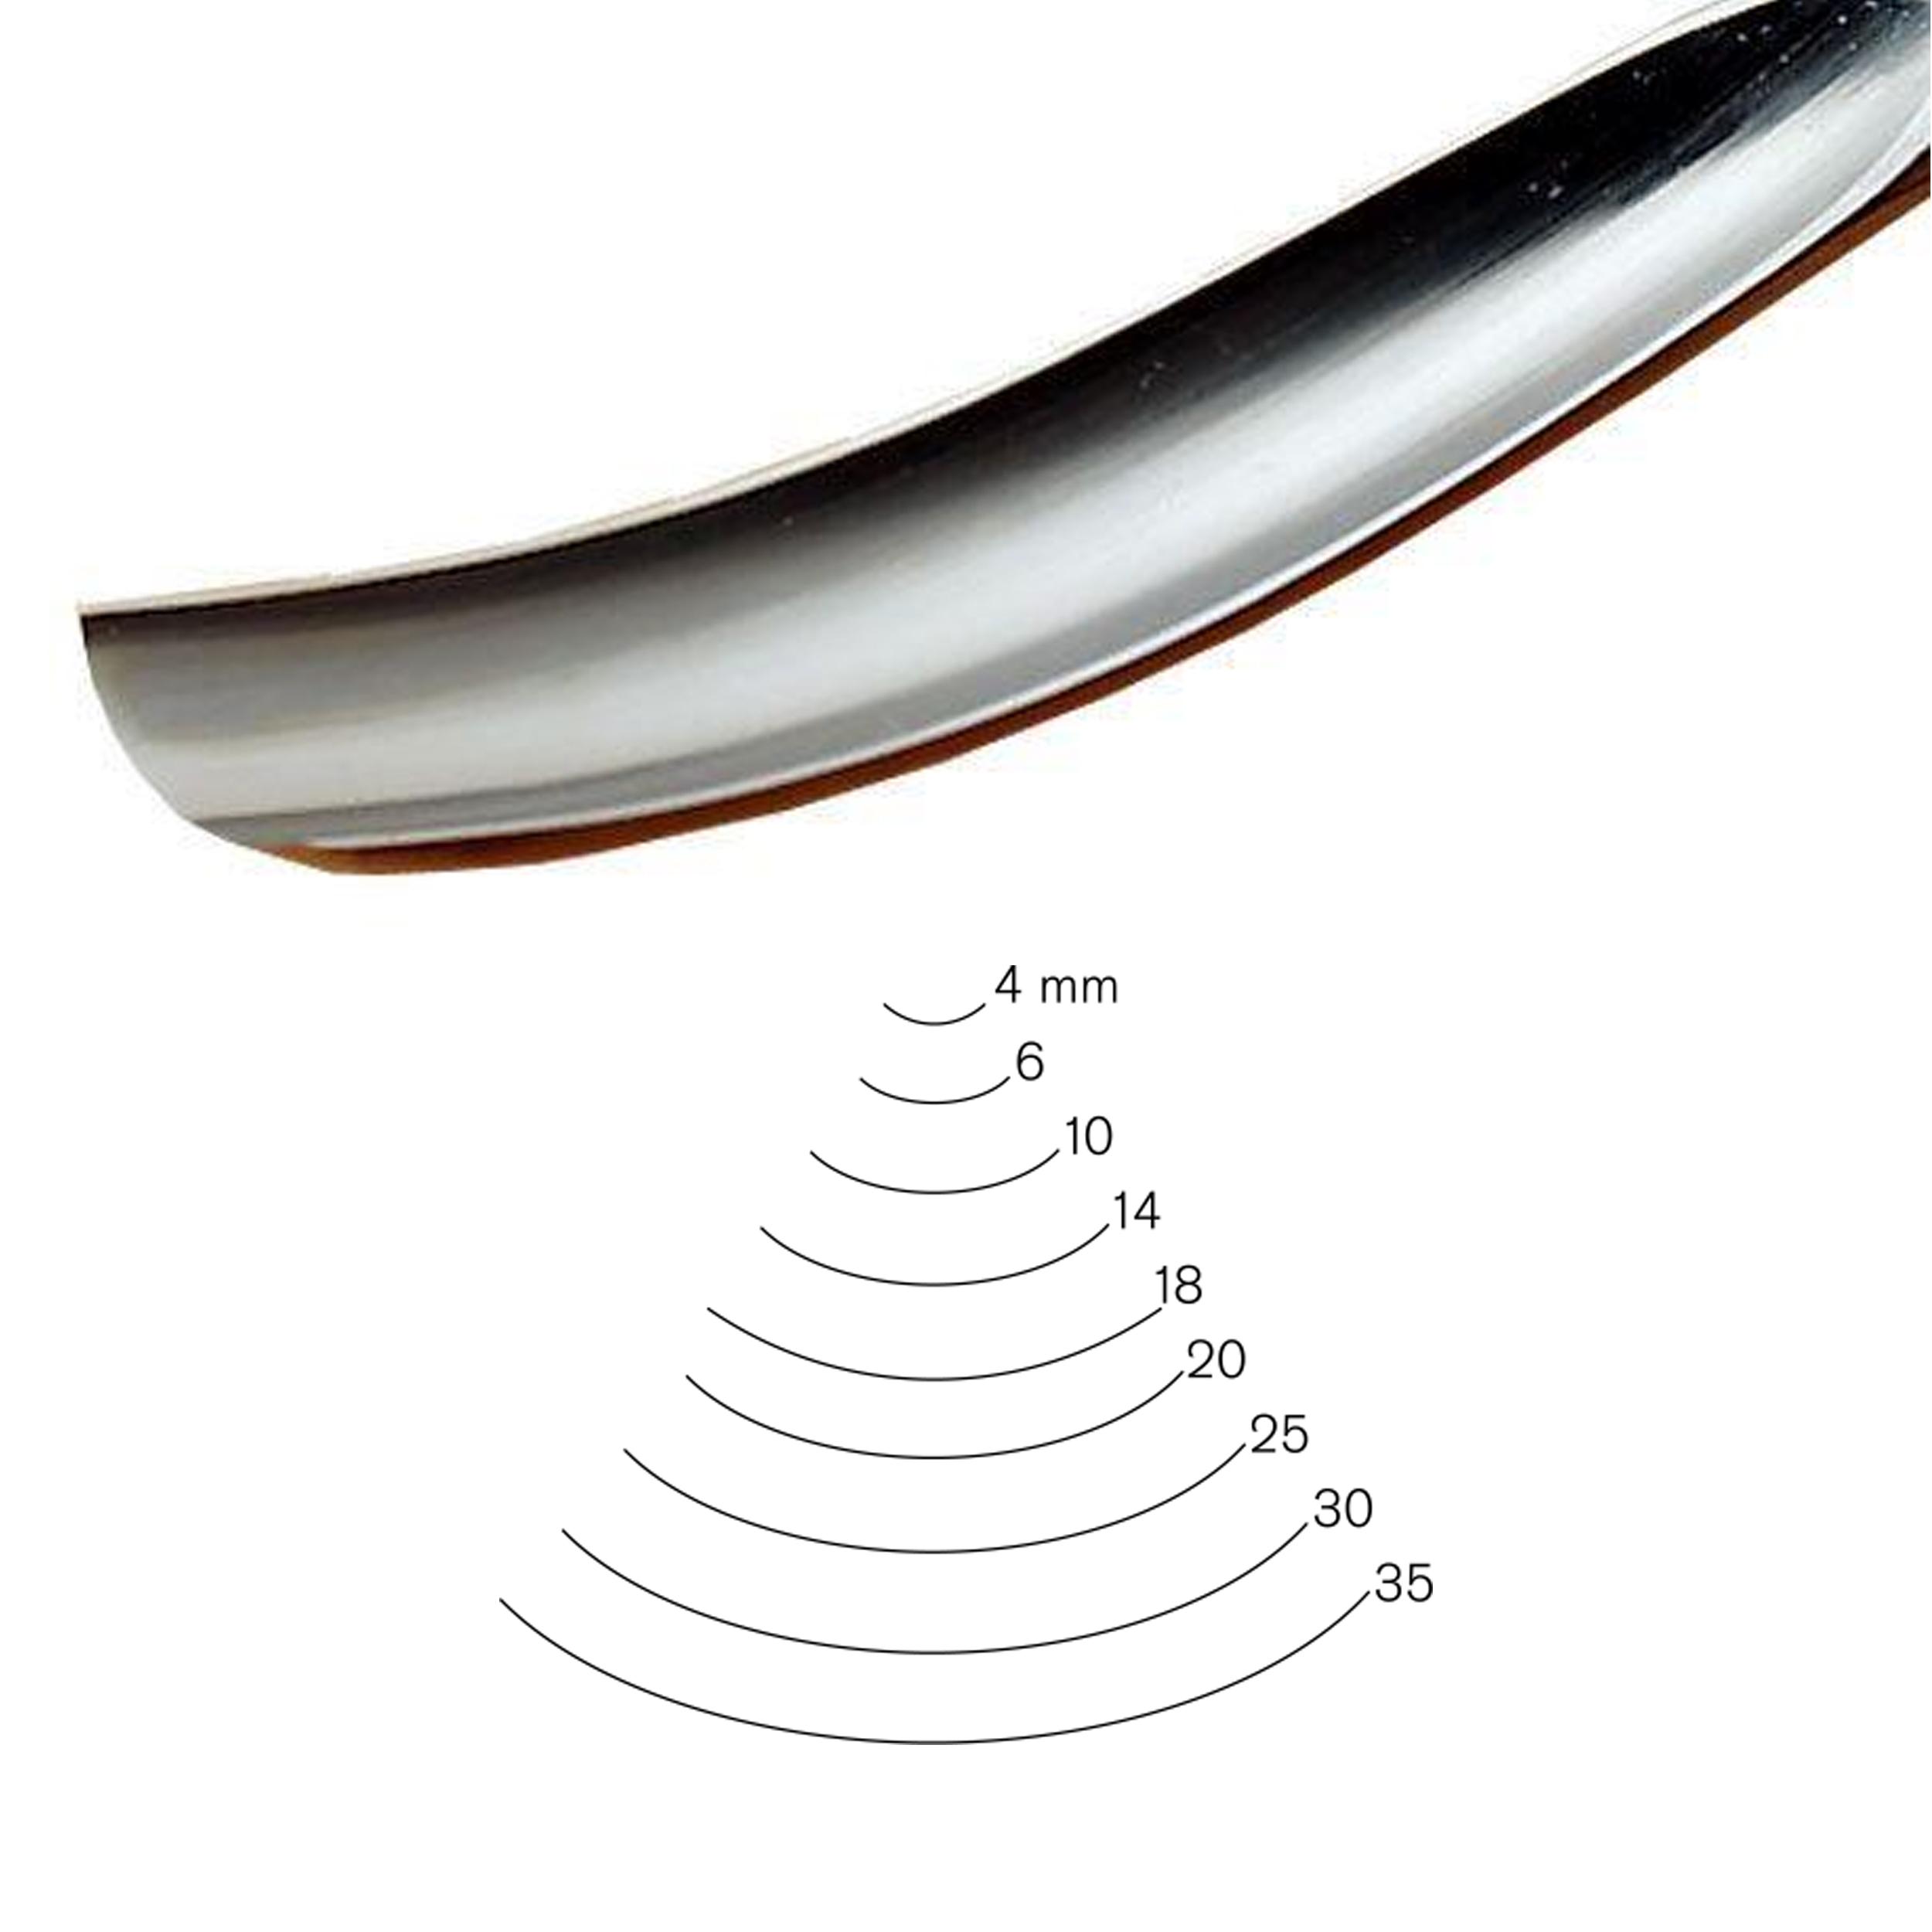 #7 Sweep Bent Gouge 18 mm Full Size